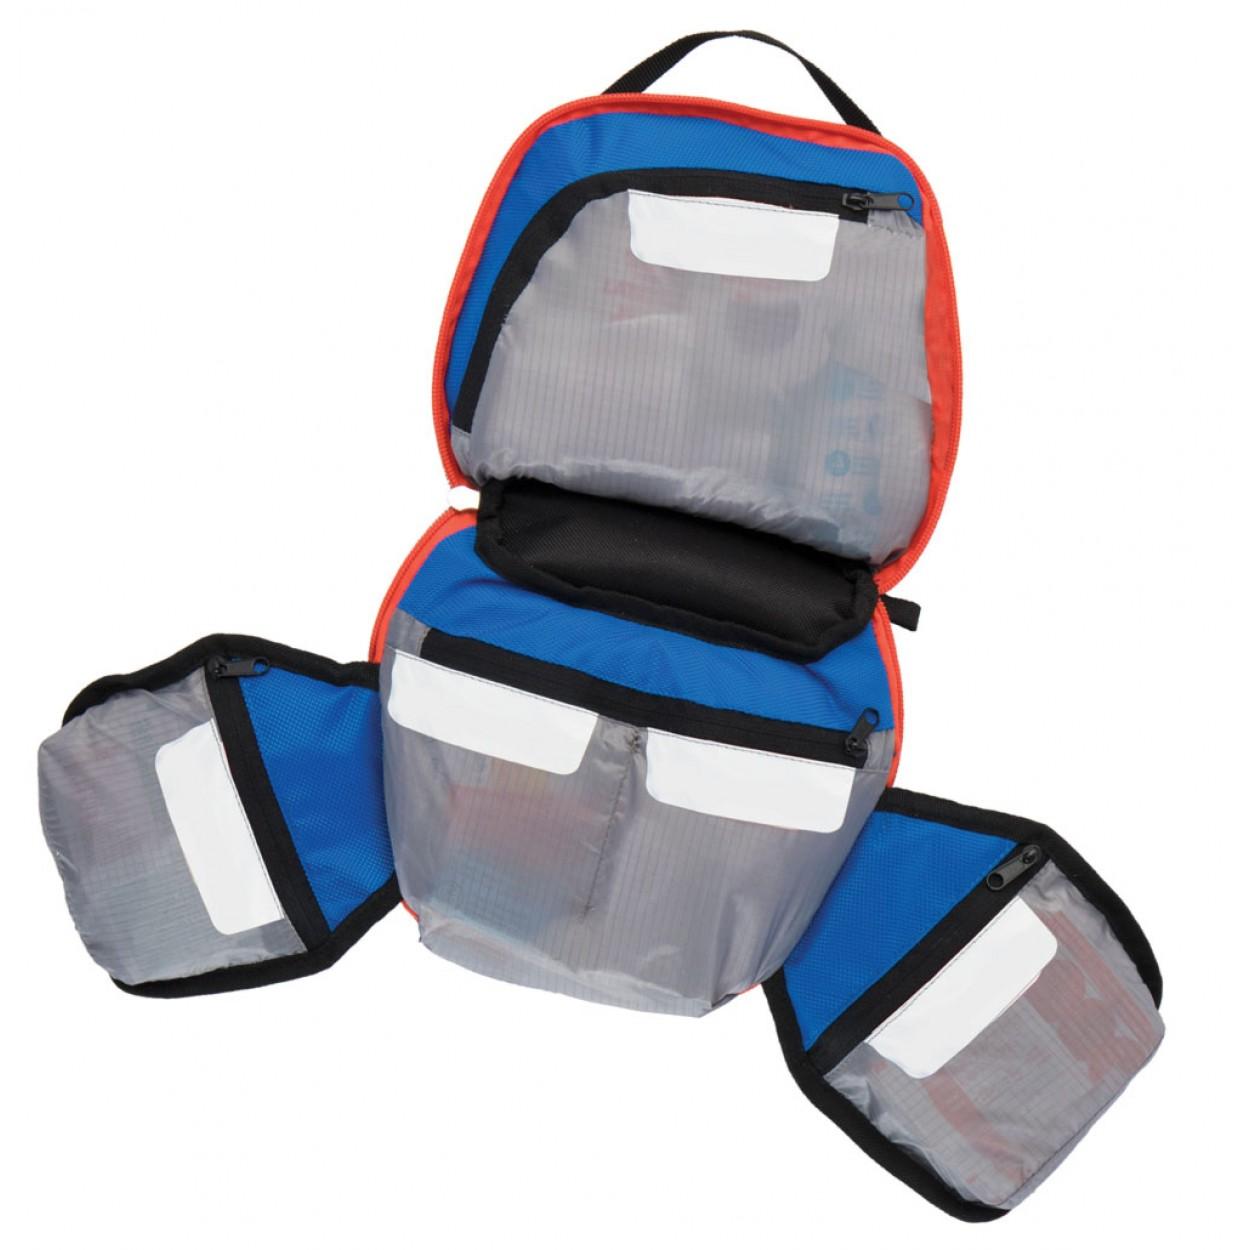 428d98fd4cf2 Mountain Series Custom Medical Kit Bag - Adventure® Medical Kits